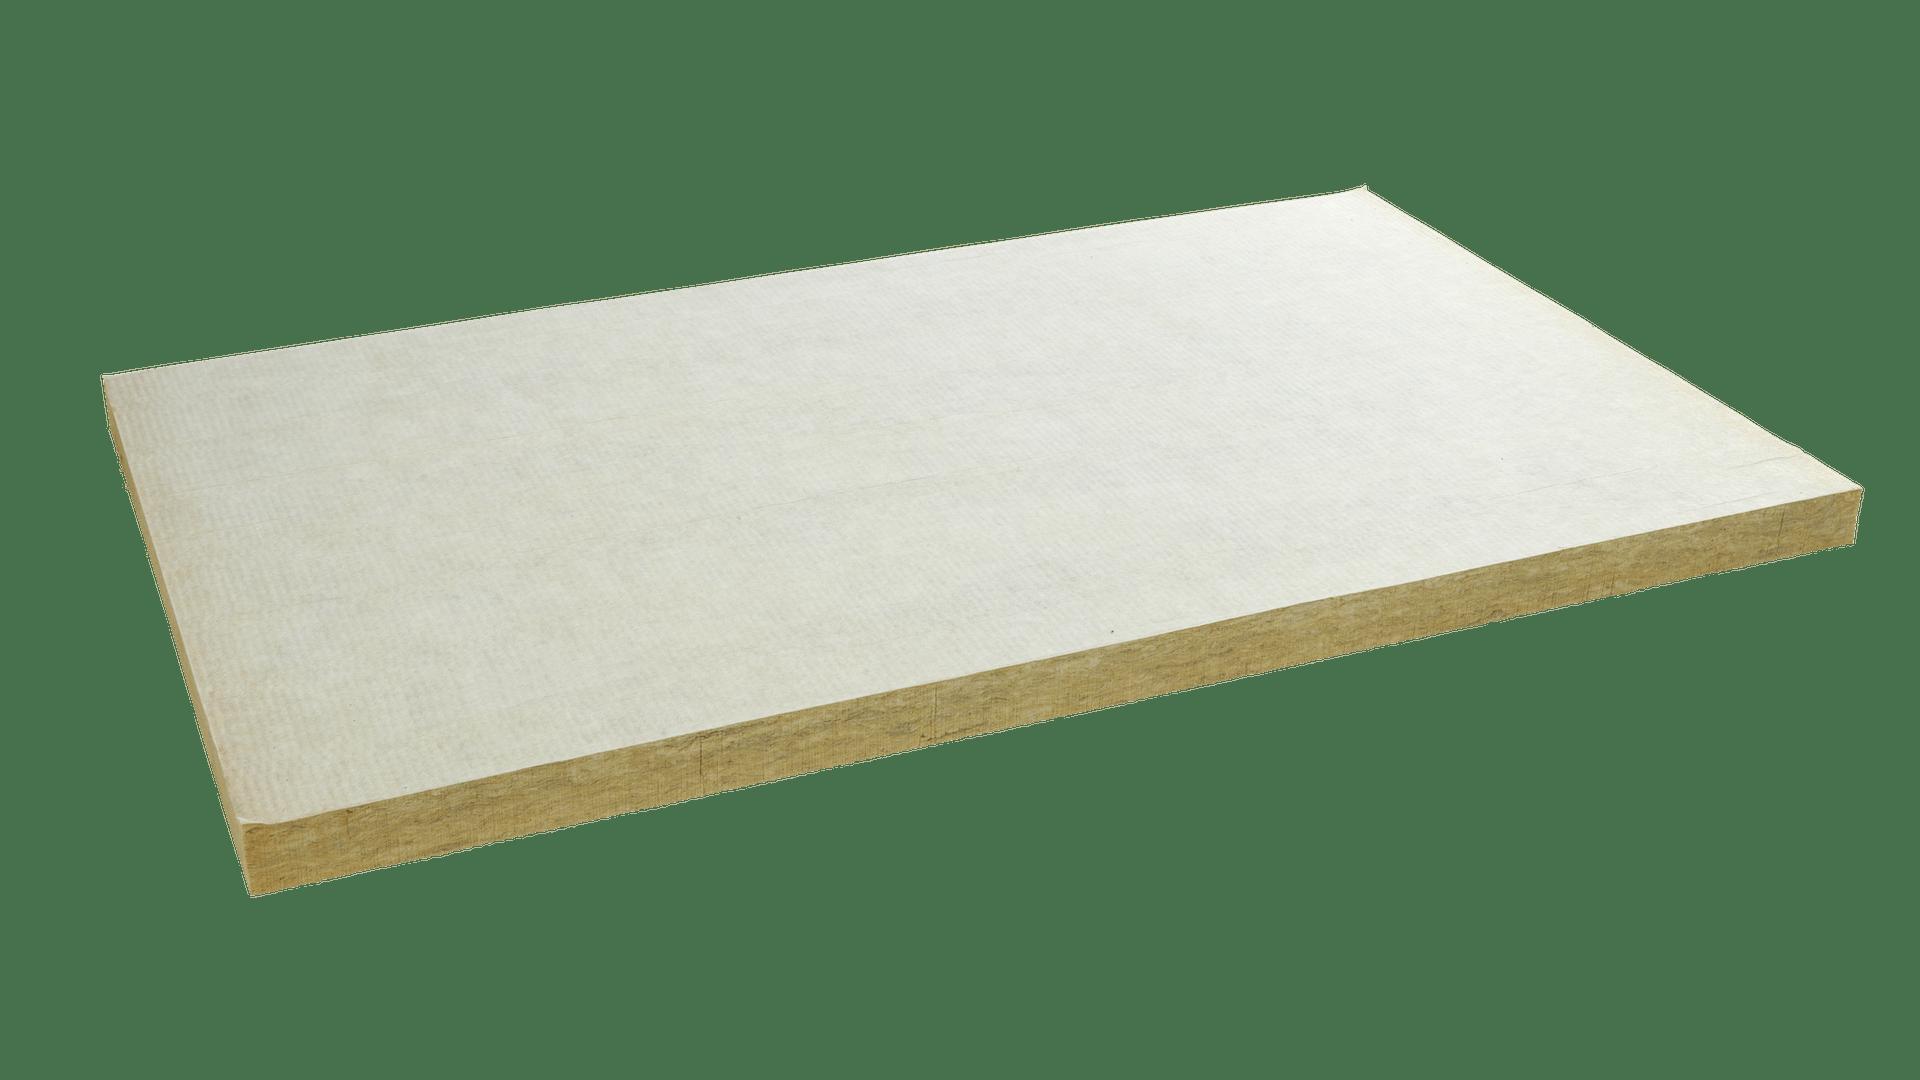 Product pictures, CONLIT 120, (Med hvid vlies), (Med vit väv)